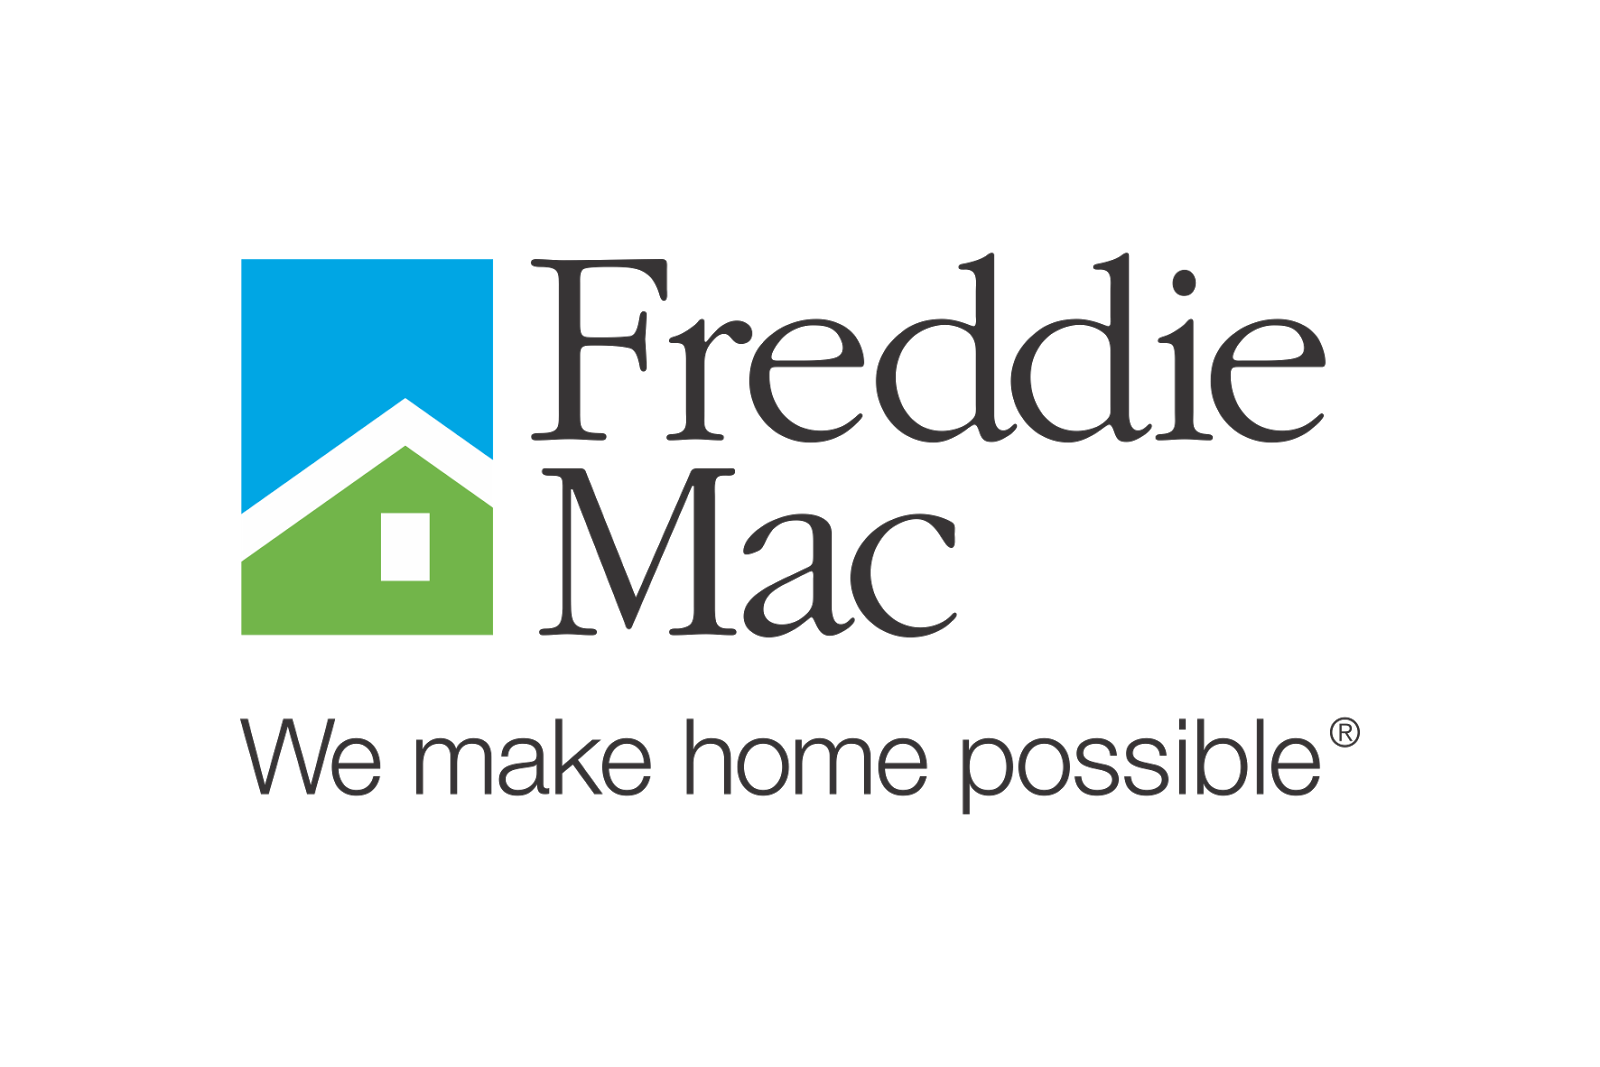 Freddie Mac Logo - Freddie Mac, Transparent background PNG HD thumbnail